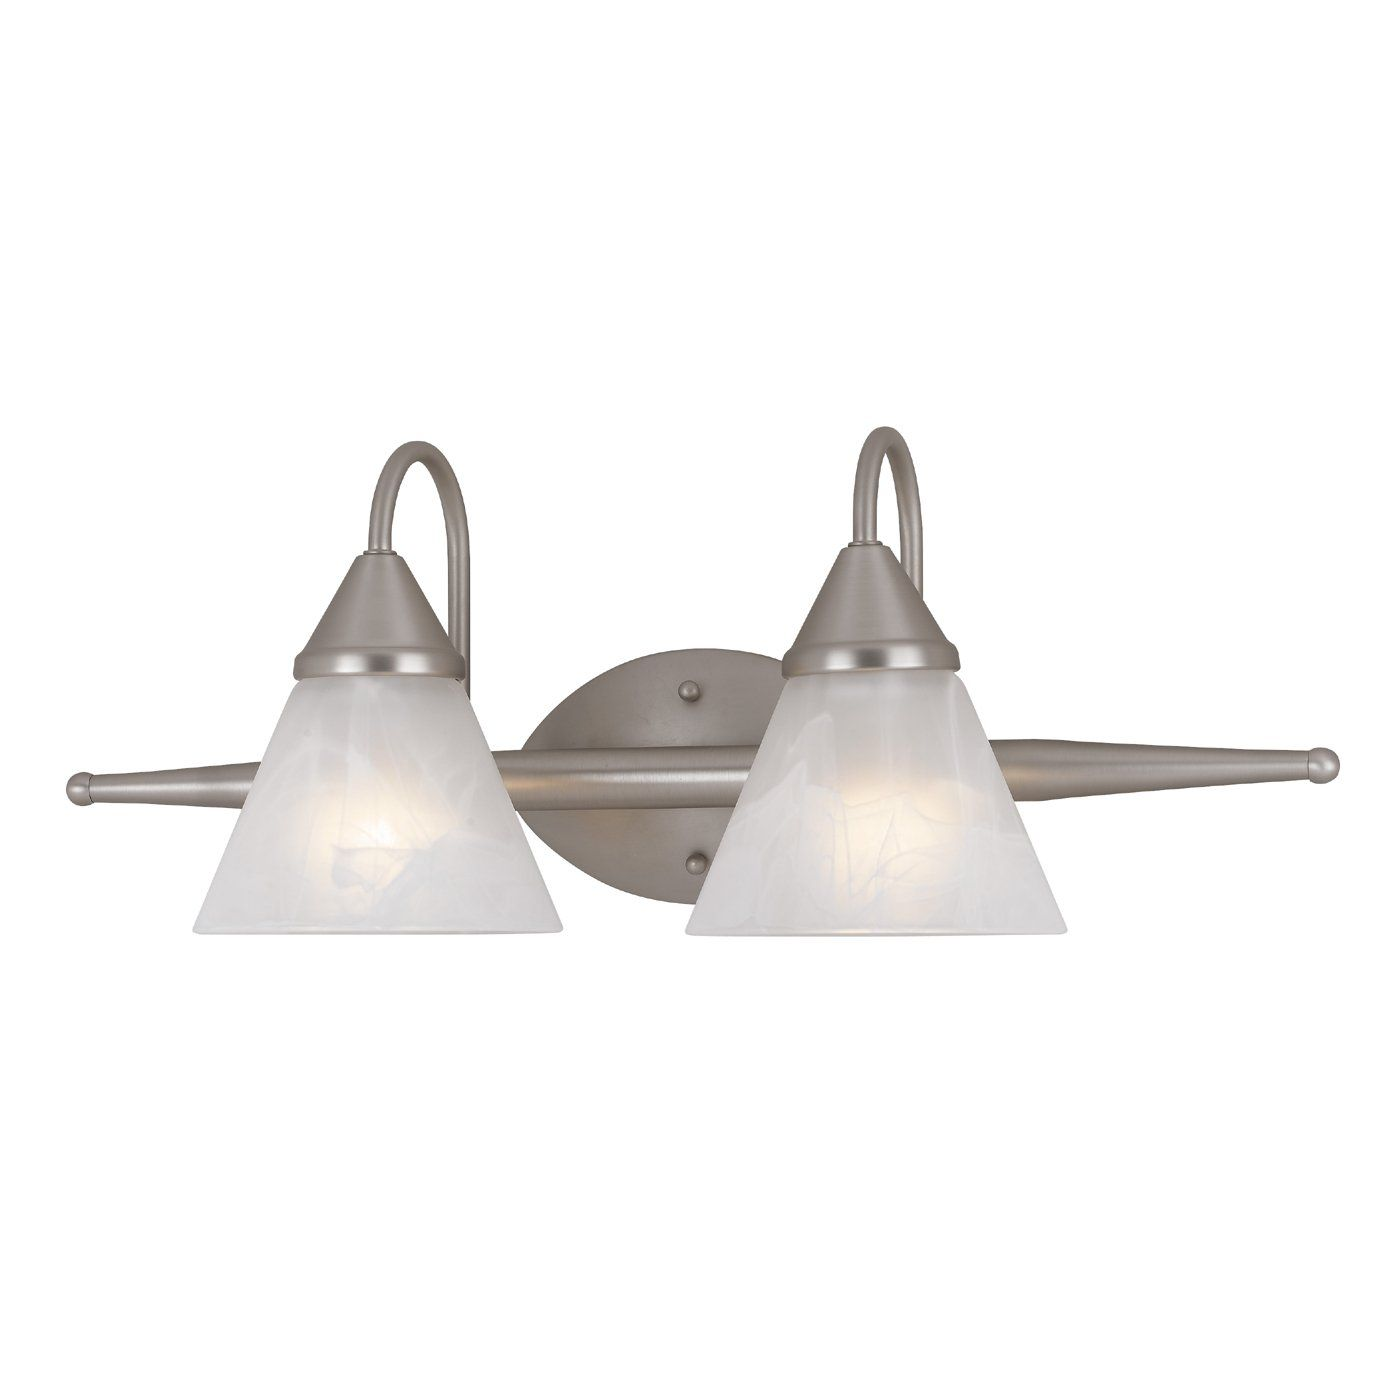 Amlite Lighting Satin Nickel 2-Light Bathroom Vanity Light ...